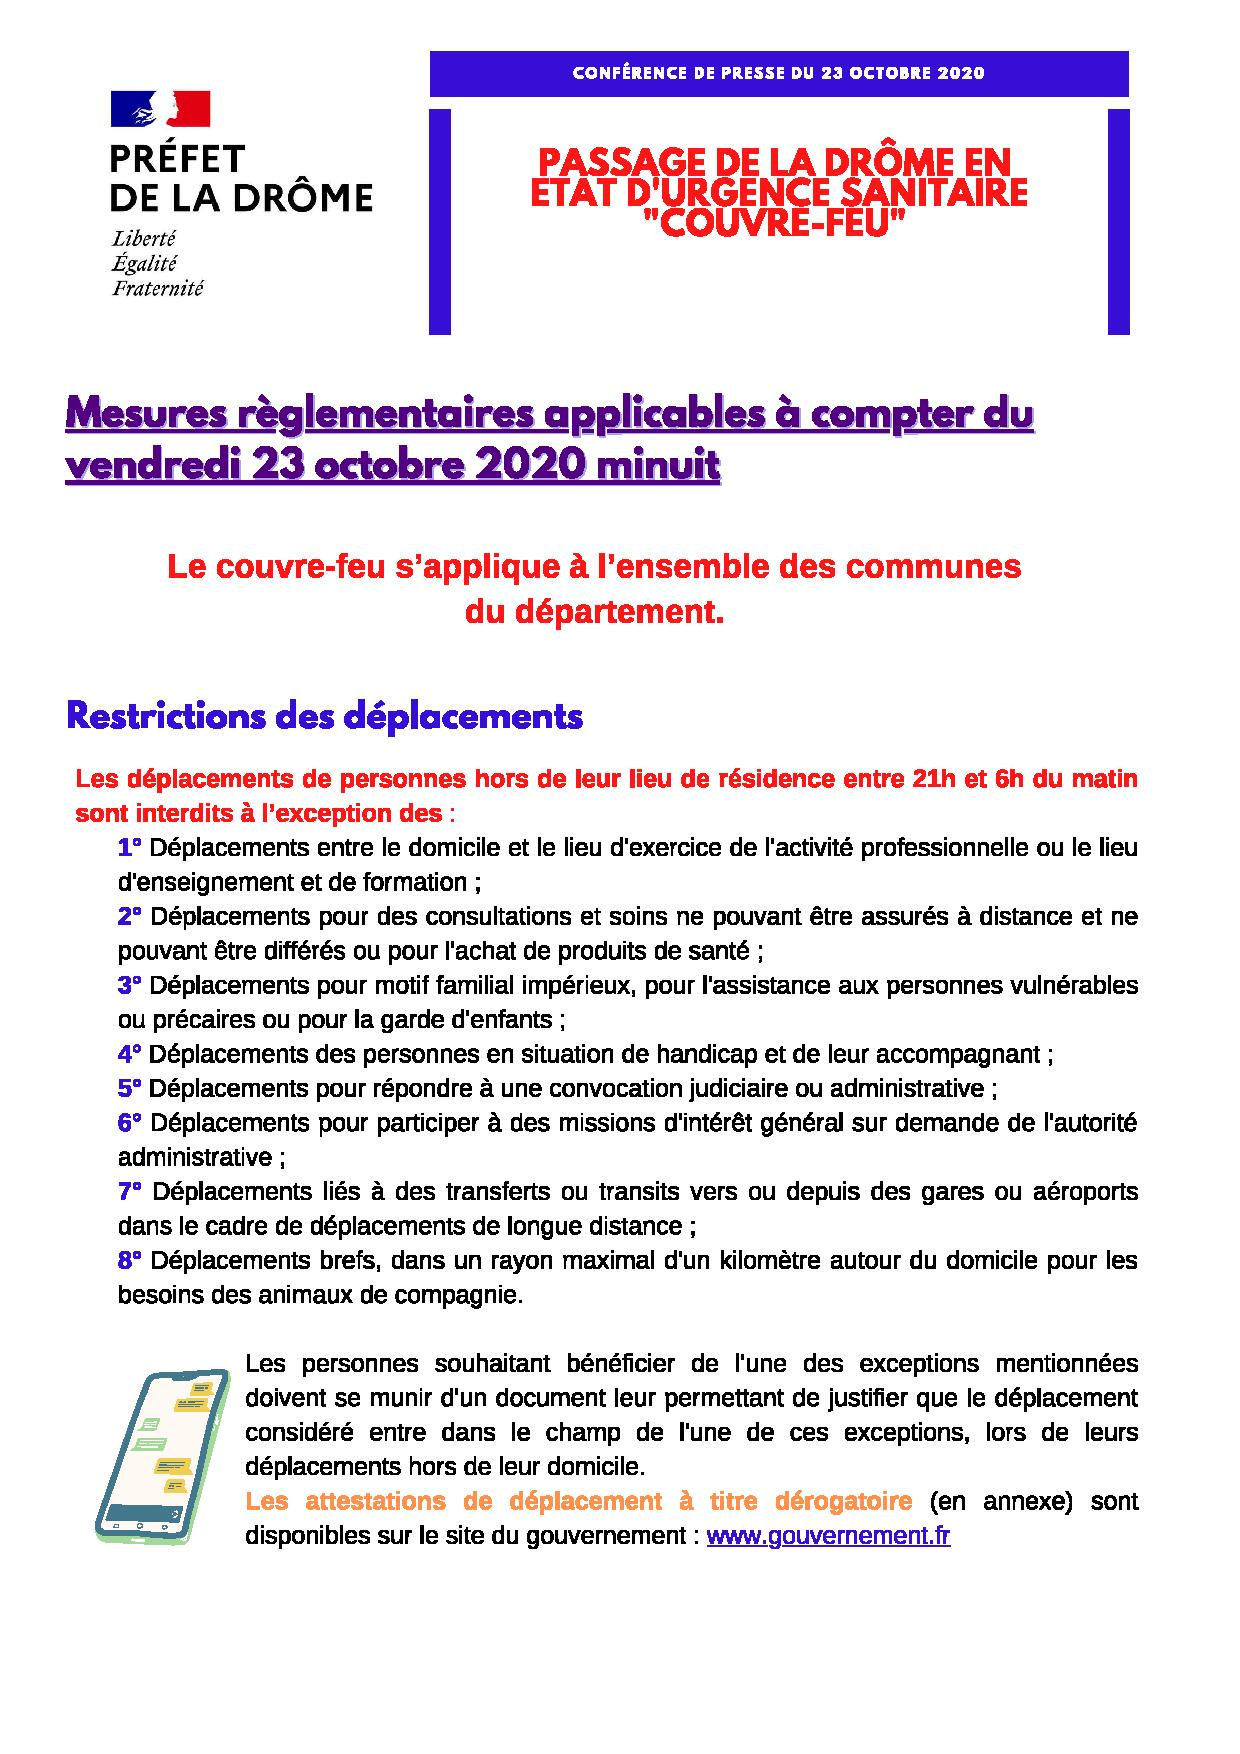 CONF PRESSE P2-page-001.jpg